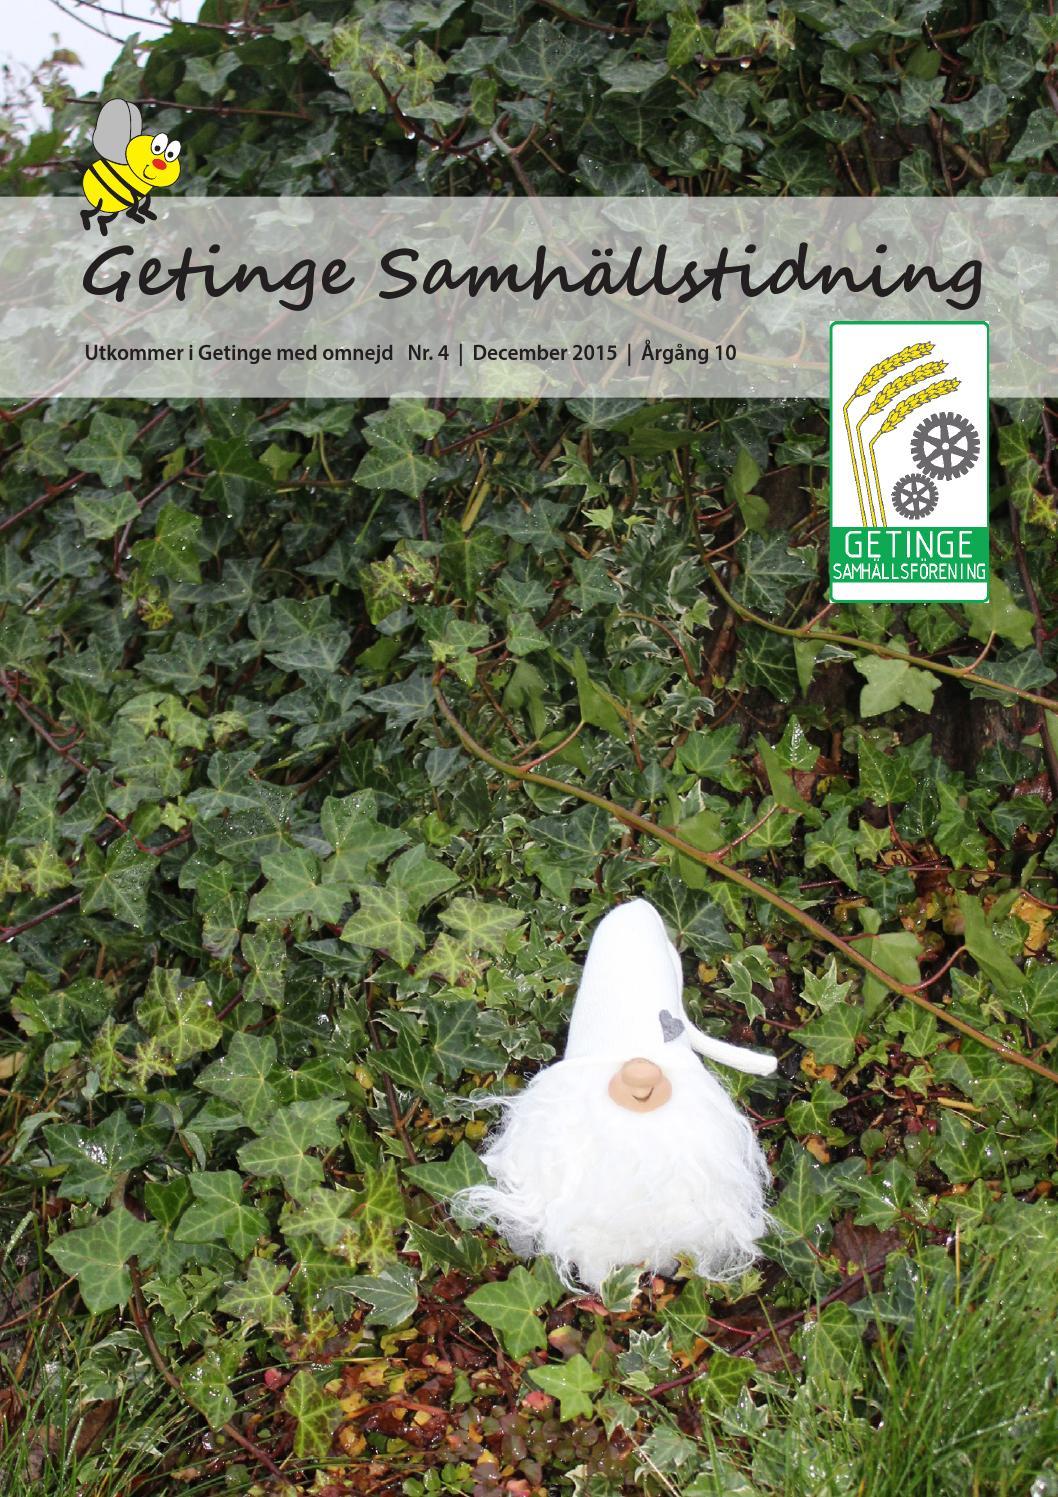 Getinge Samhllstidning september, 2014 by Getinge - Issuu